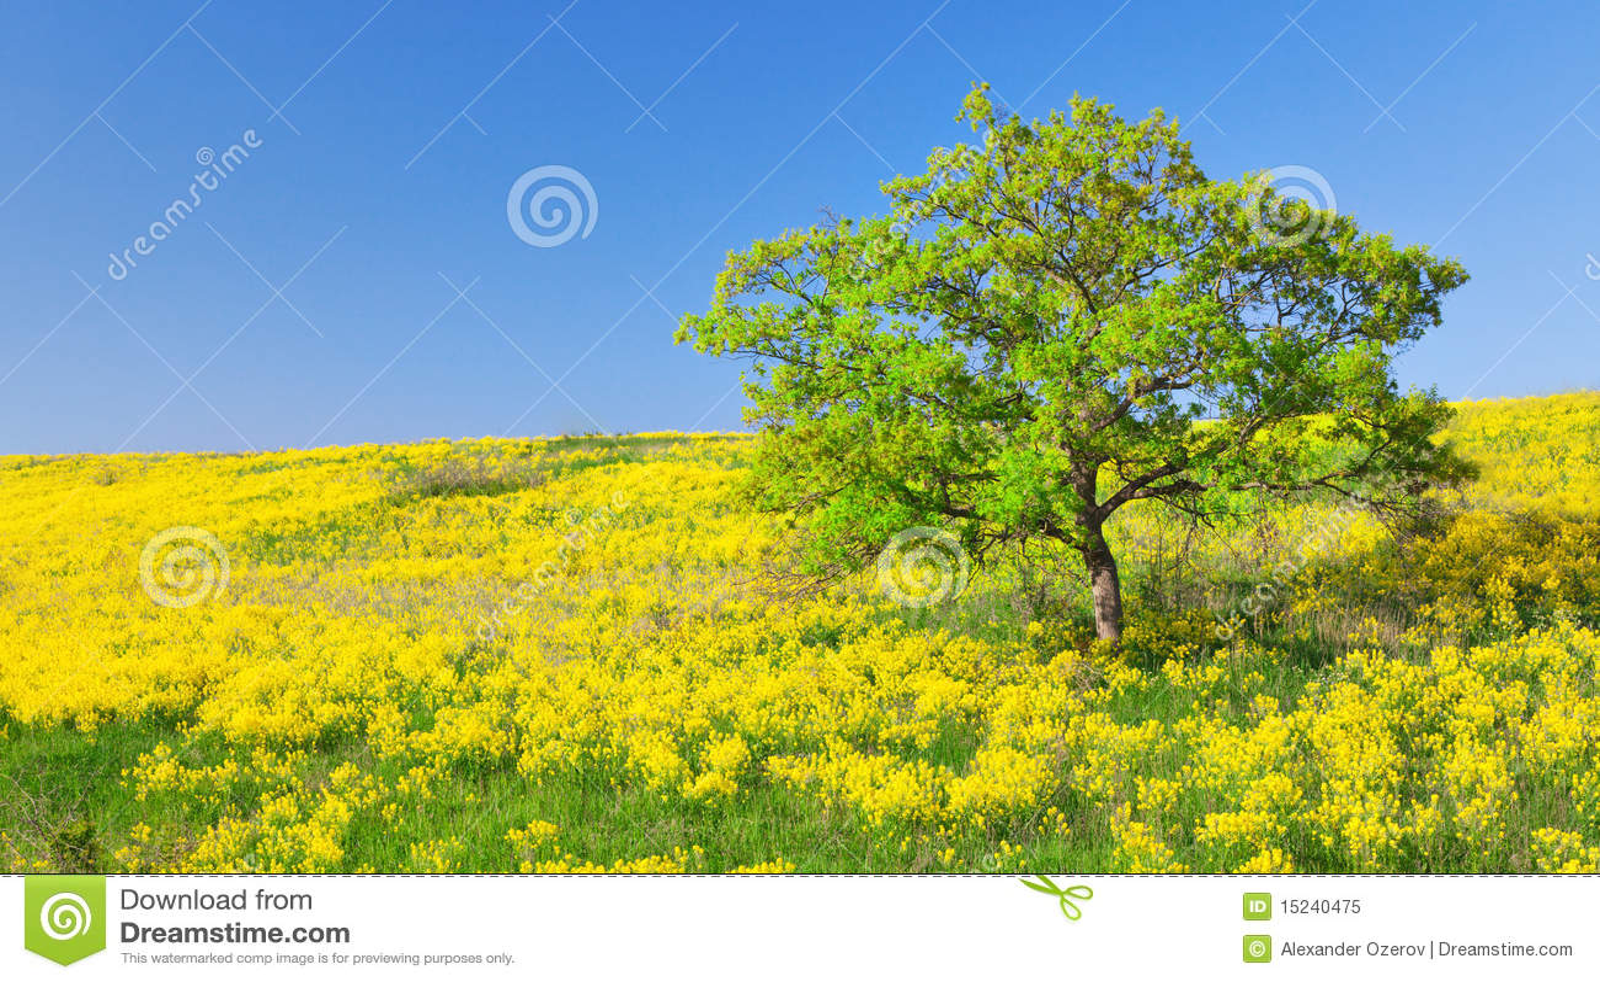 Field of yellow flowers and green tree stock image image of nobody field of yellow flowers and green tree mightylinksfo